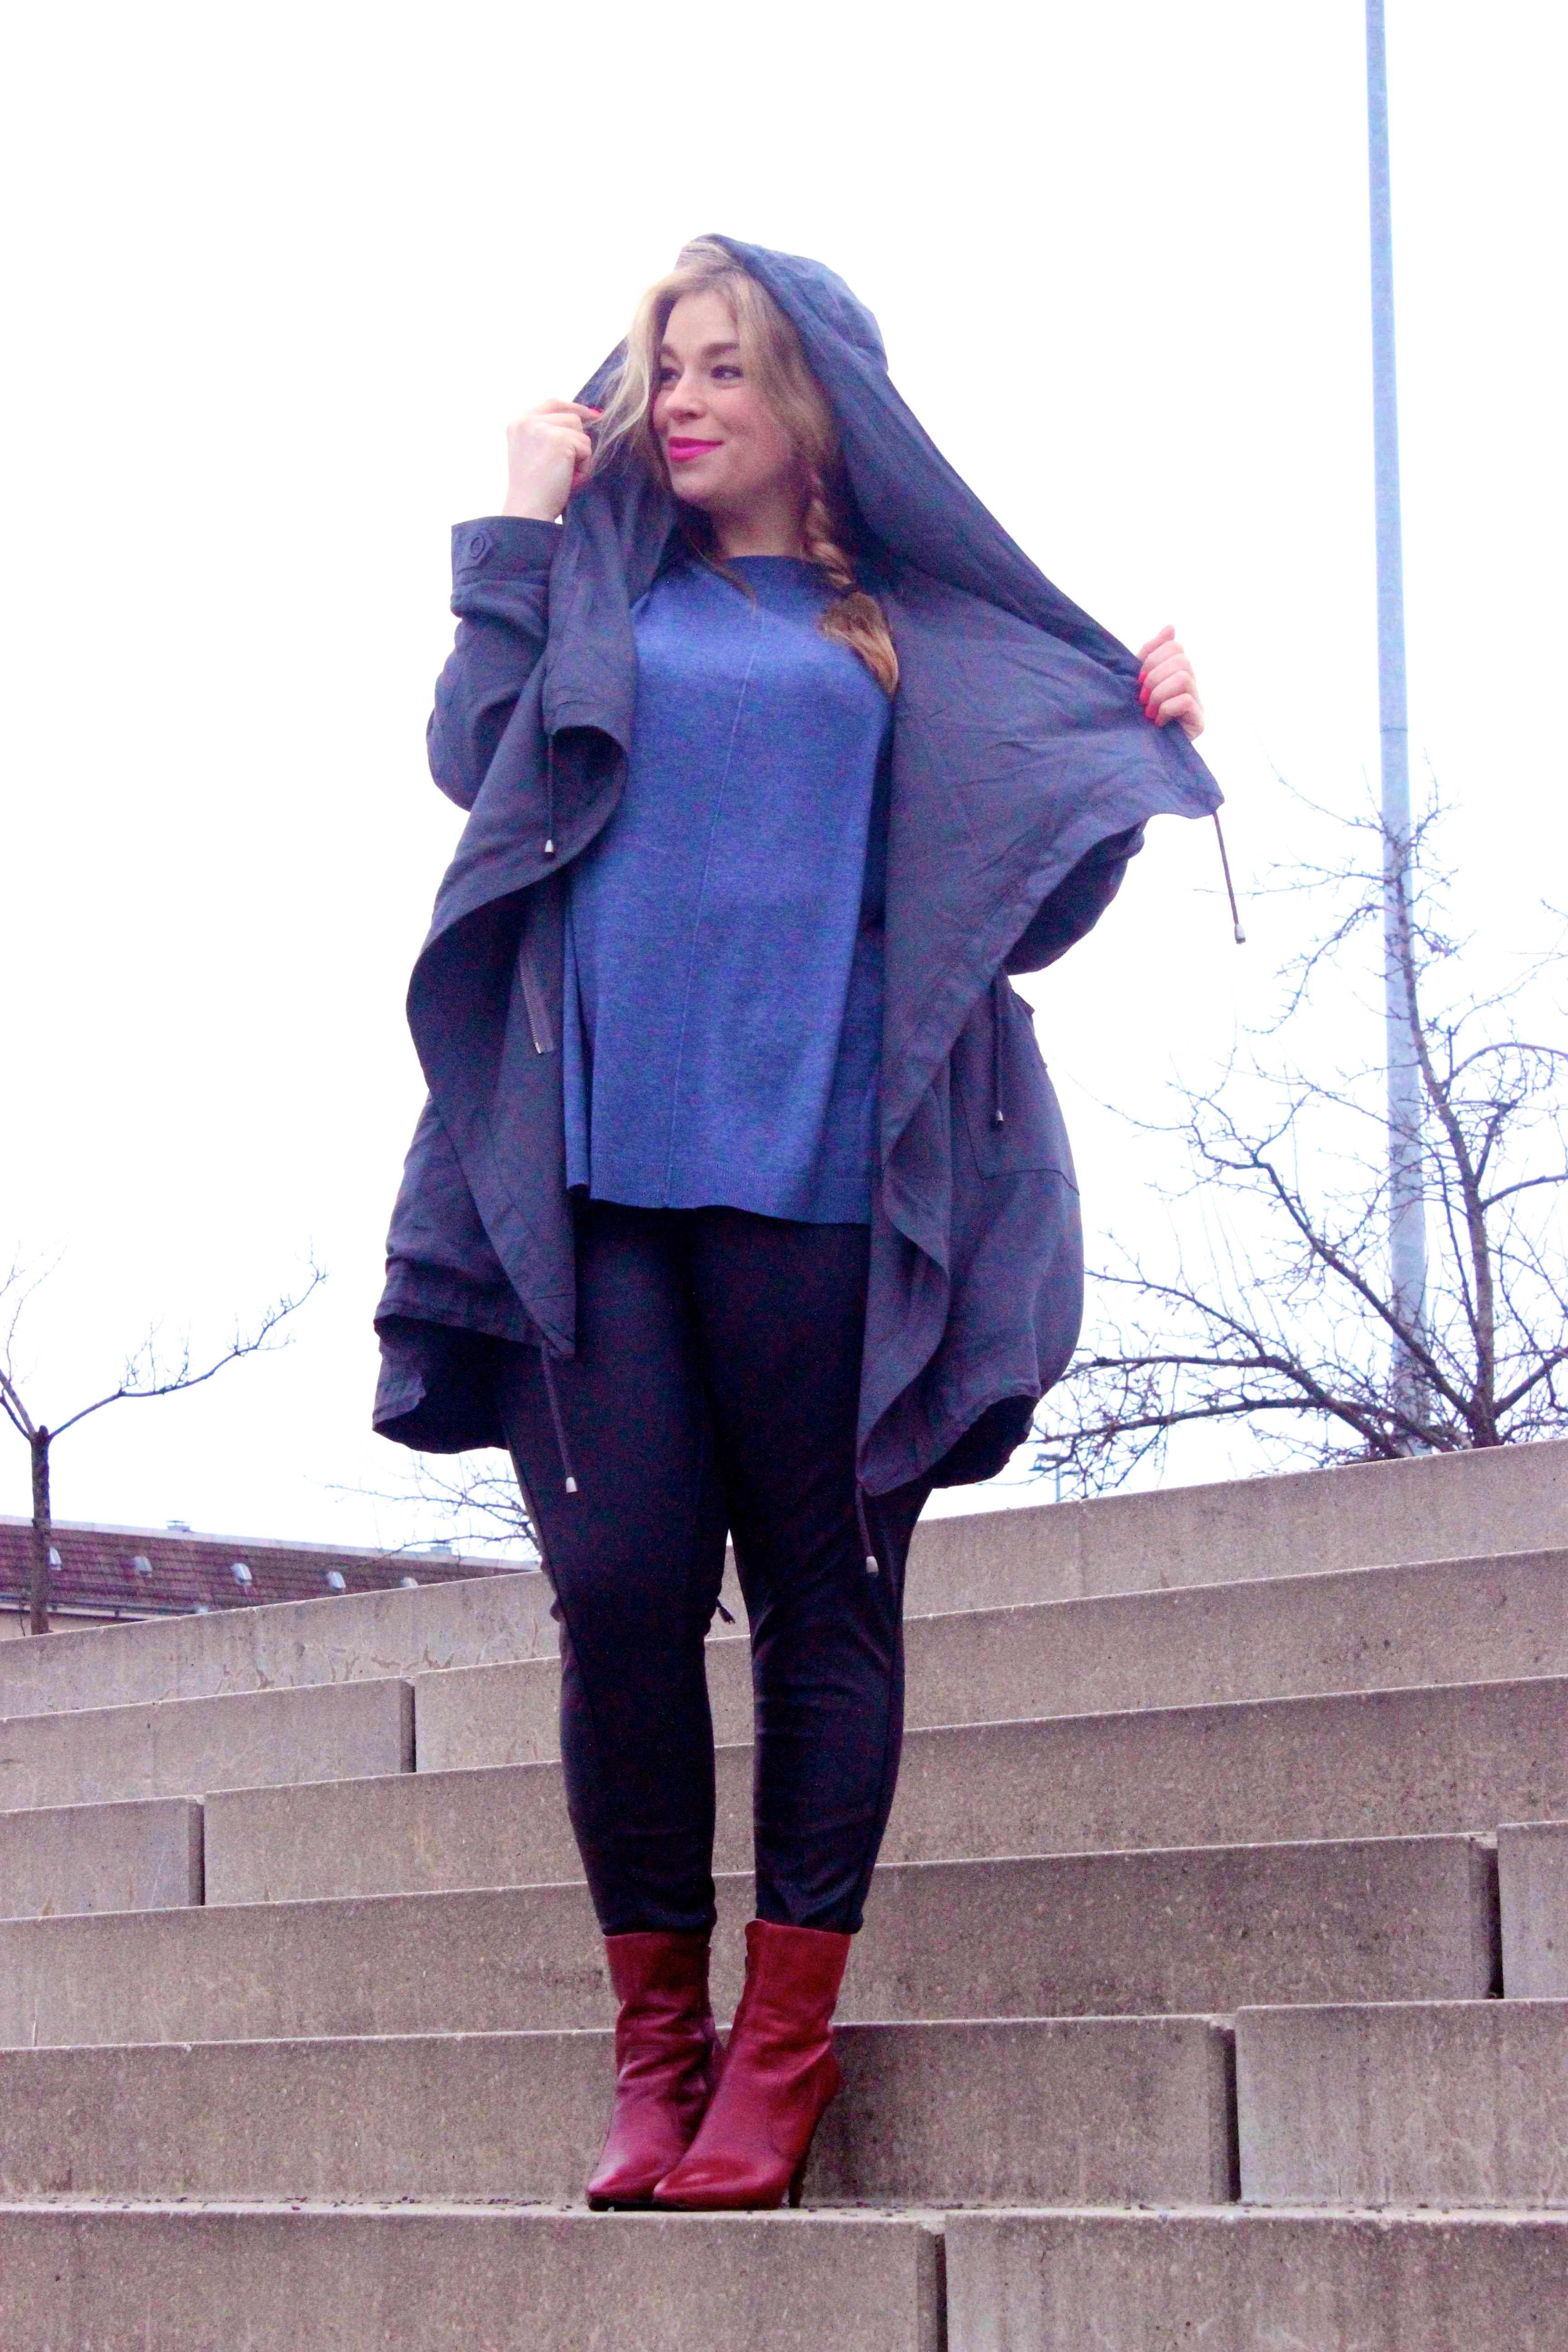 Megabambi-Caterina-pogorzelski-Plussize-curvy-Blog-Berlin-Mode-Model-Moderatorin